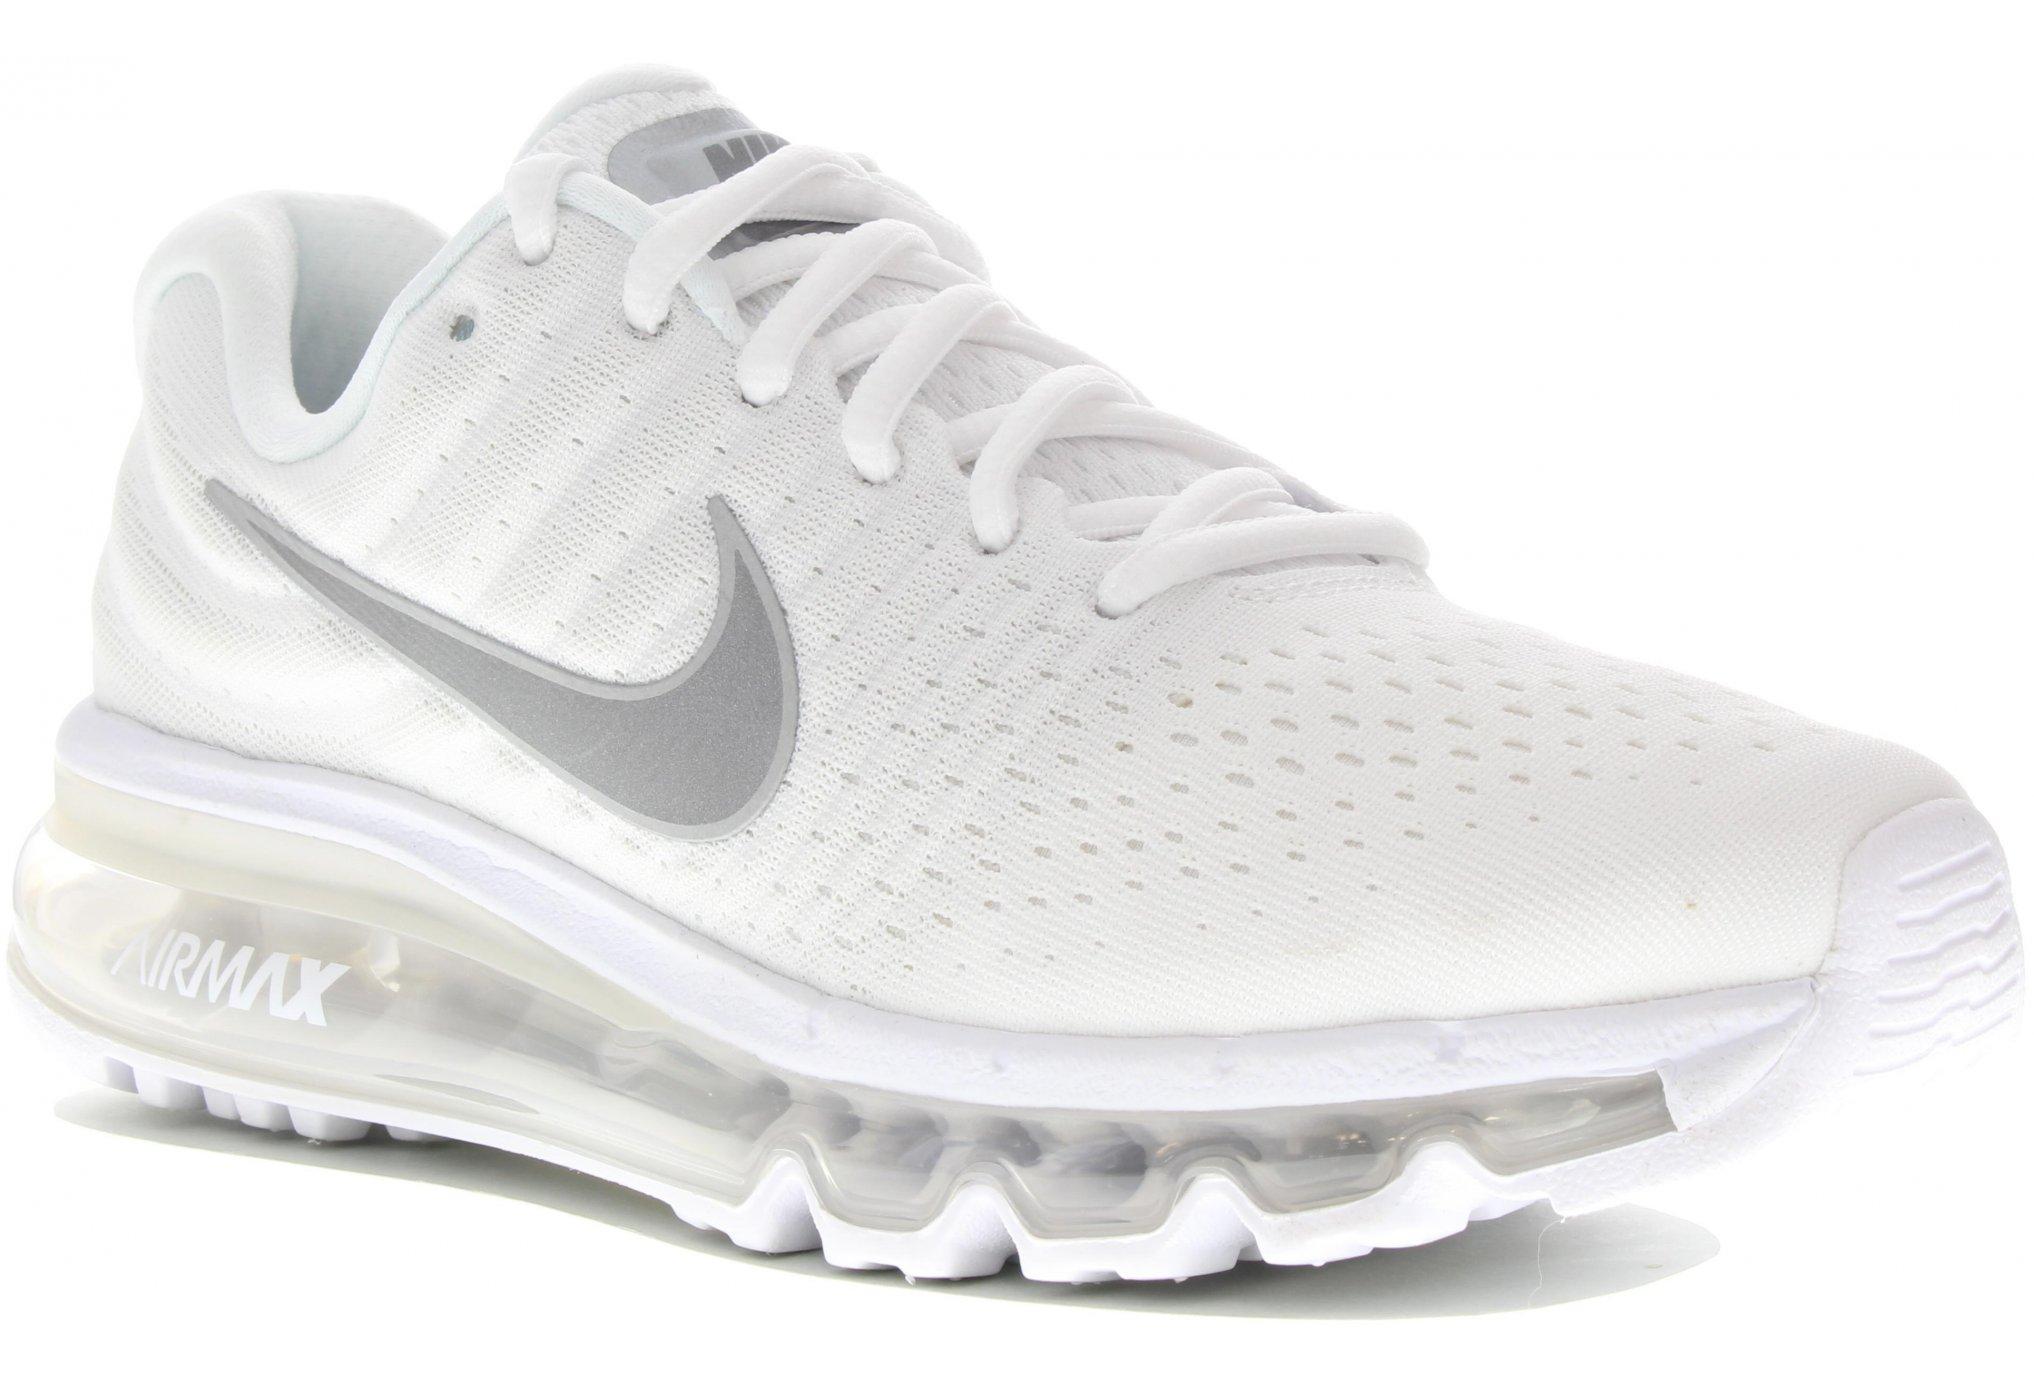 Nike Air Max GS Chaussures homme